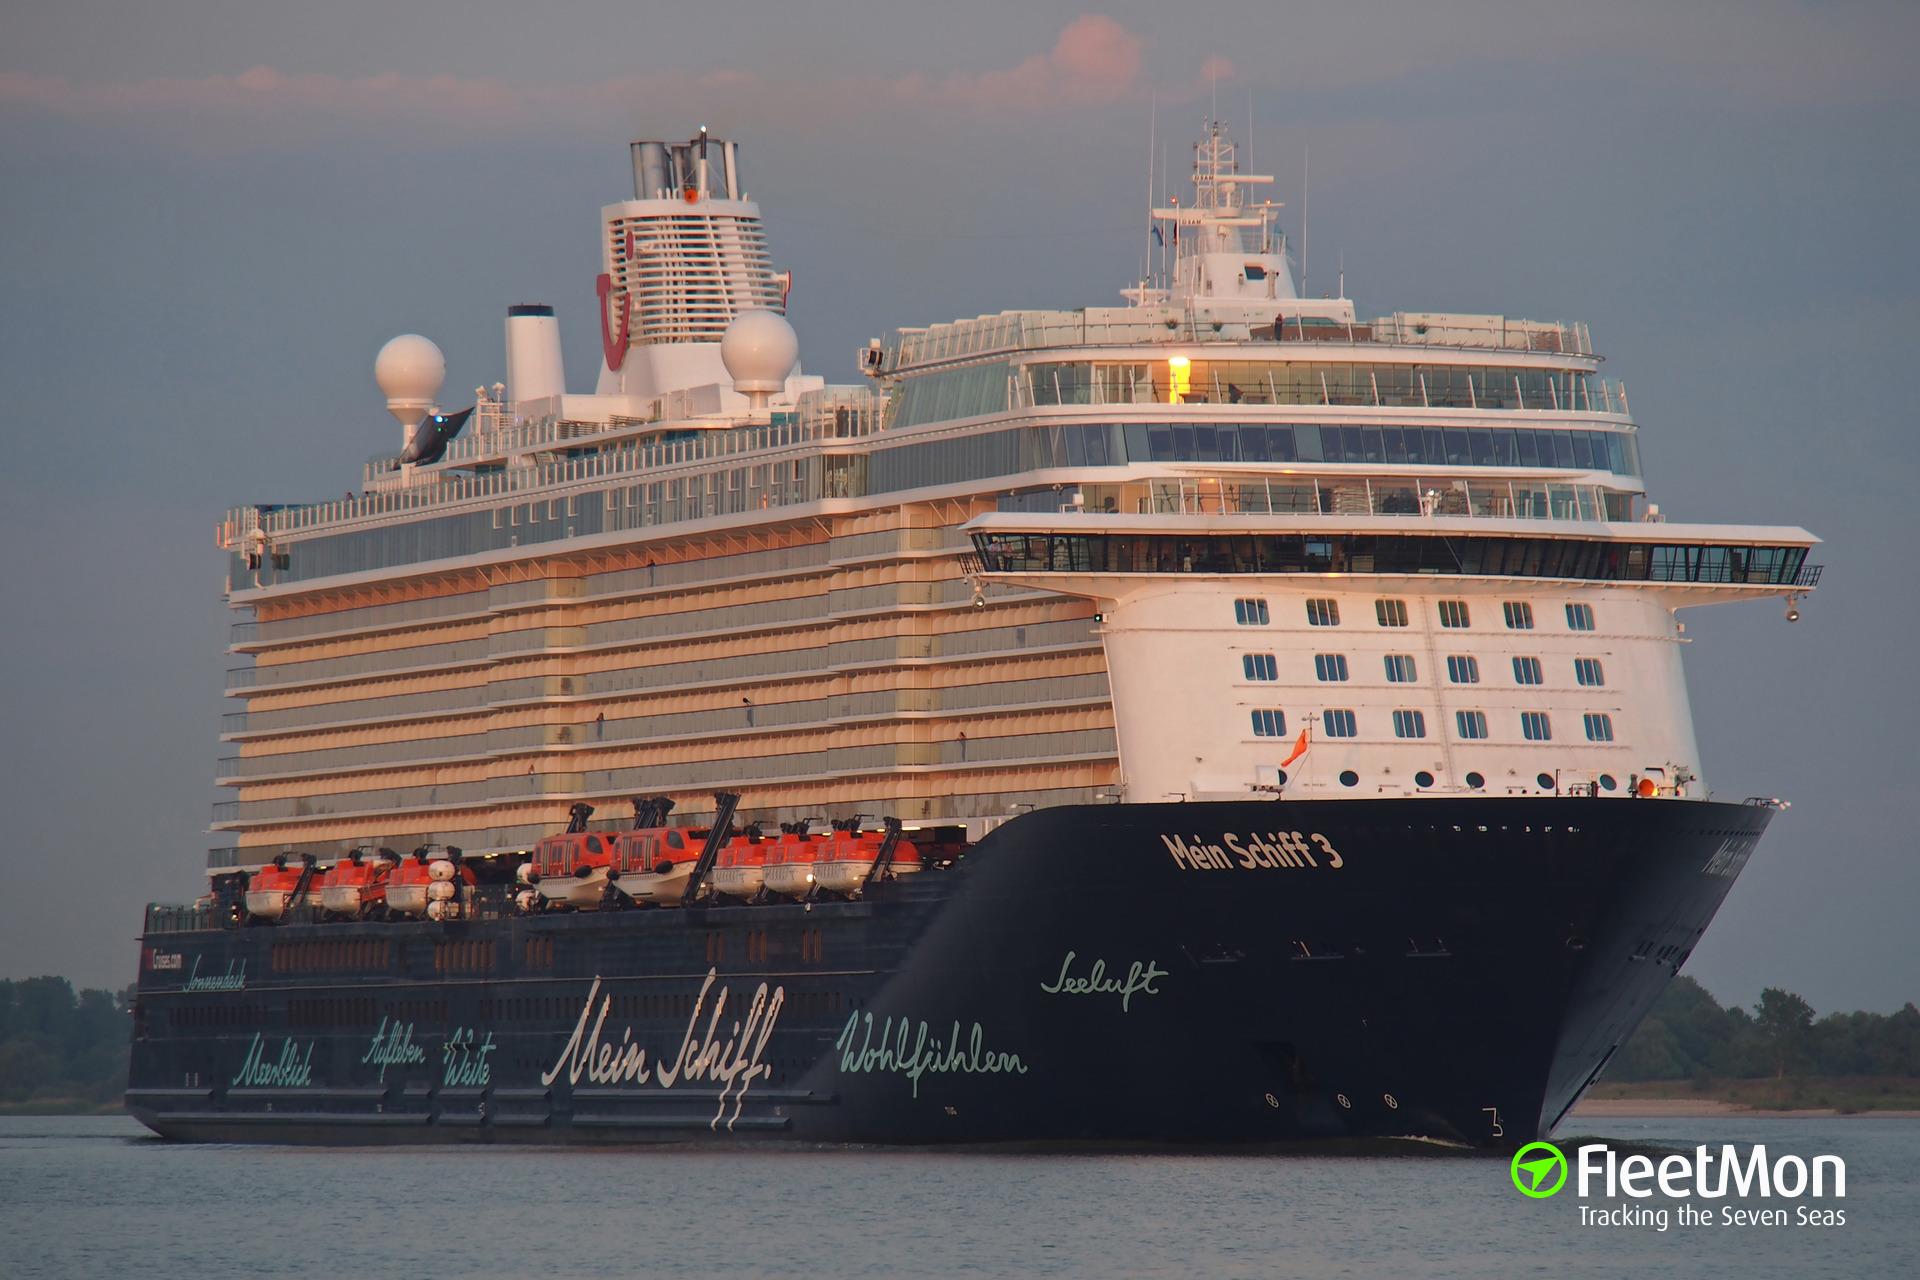 Cruise liner Mein Schiff 3 tore off three bollards in Santa Cruz de La Palma